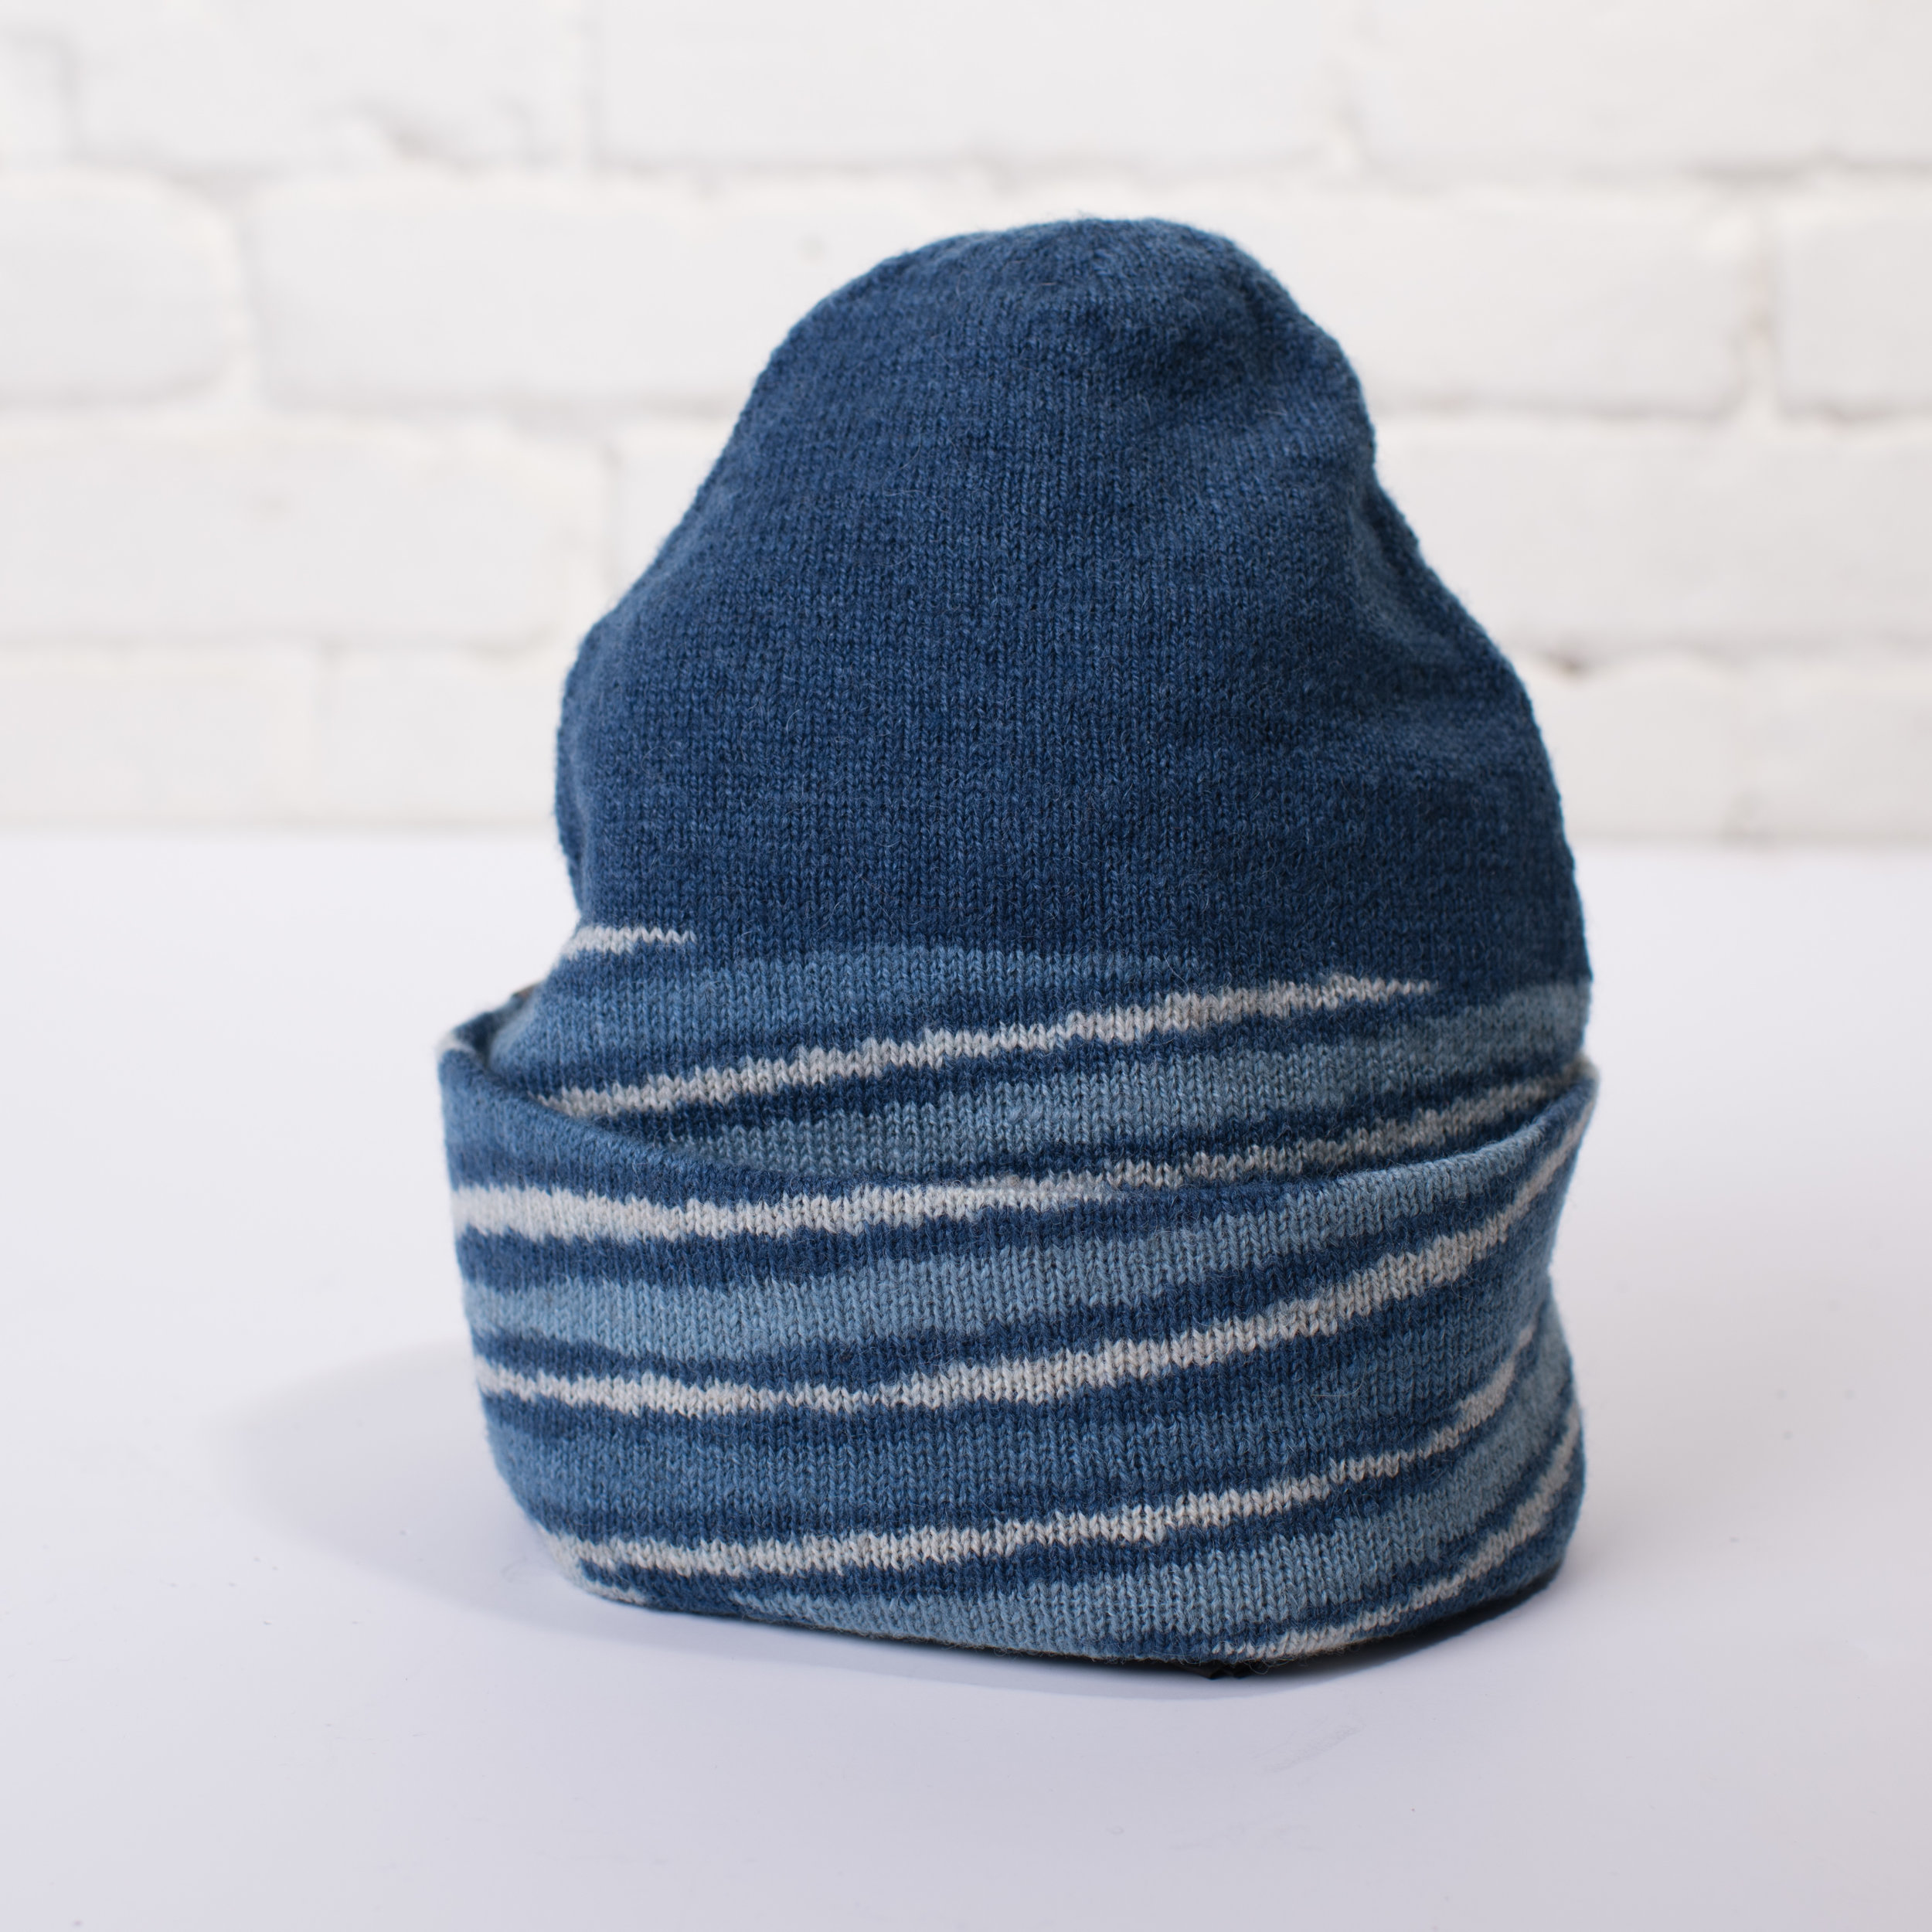 Sky Like Snow + COOL HUNTING Omakase Edition Indigo Hats